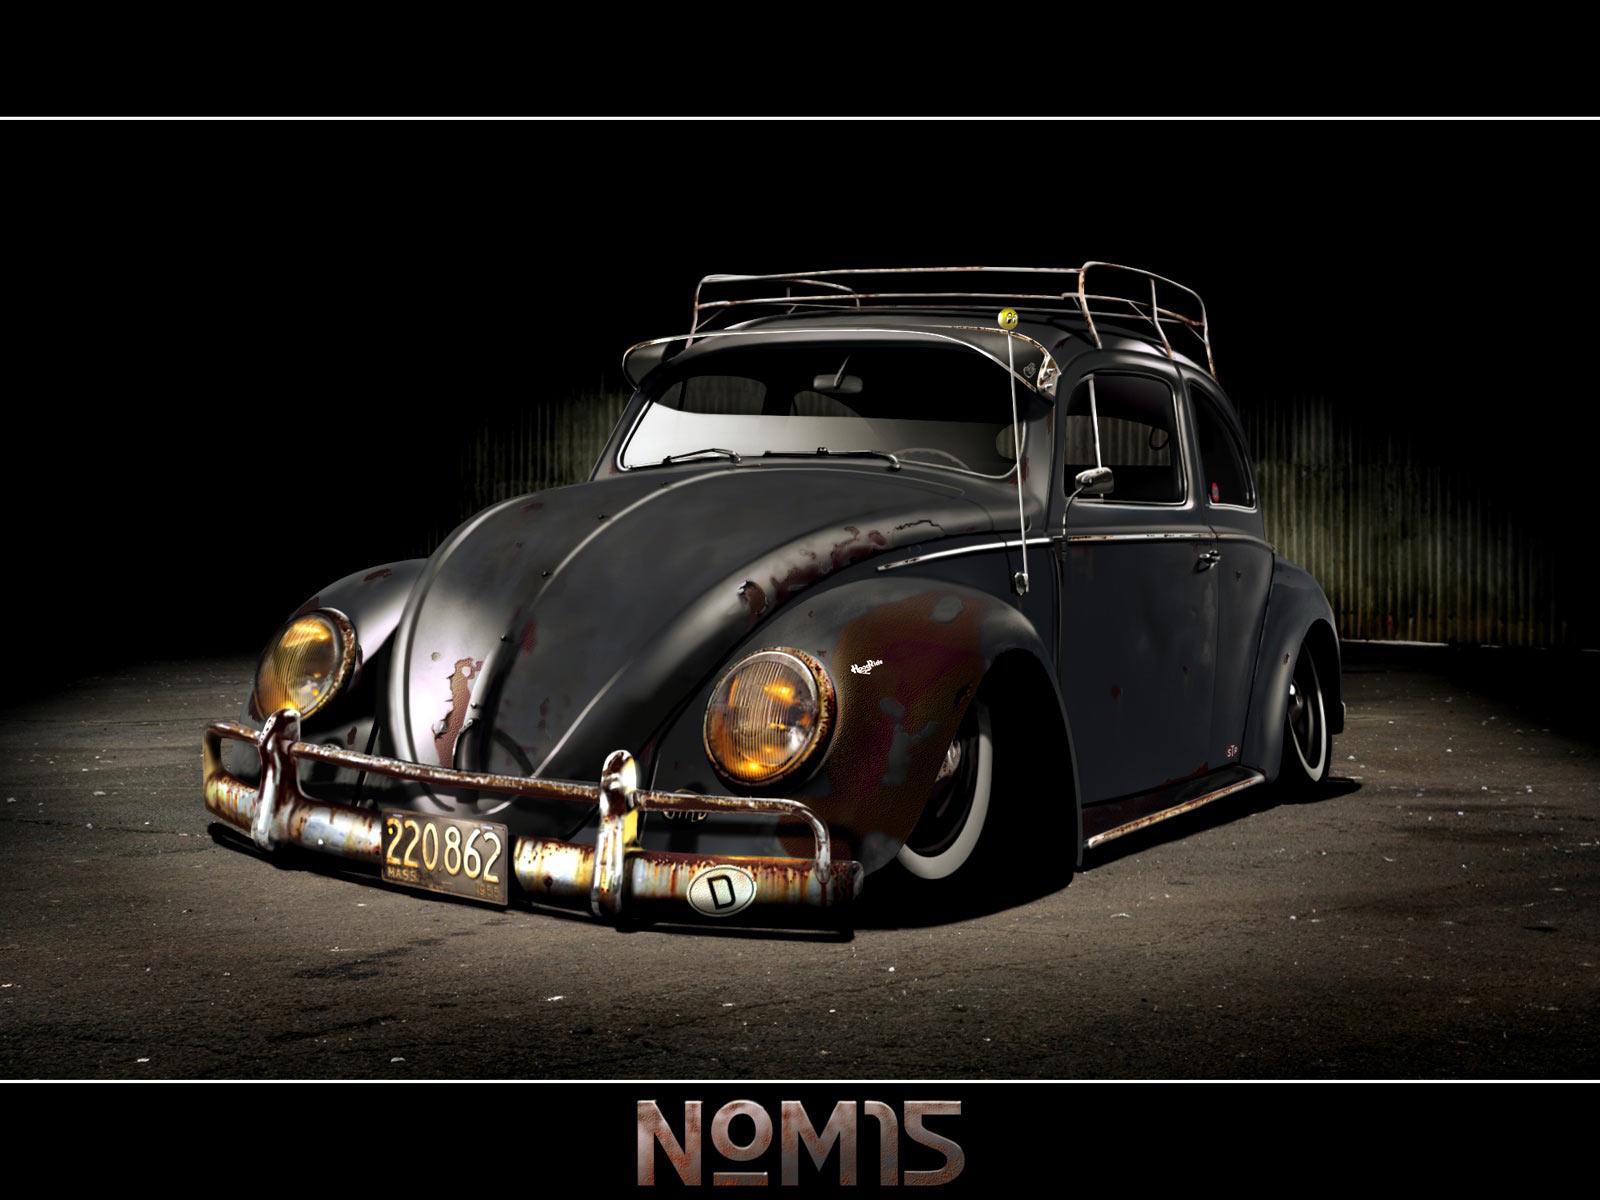 classic car retro cars wallpapers 1600x1200fantom xpcomwallpapers 1600x1200